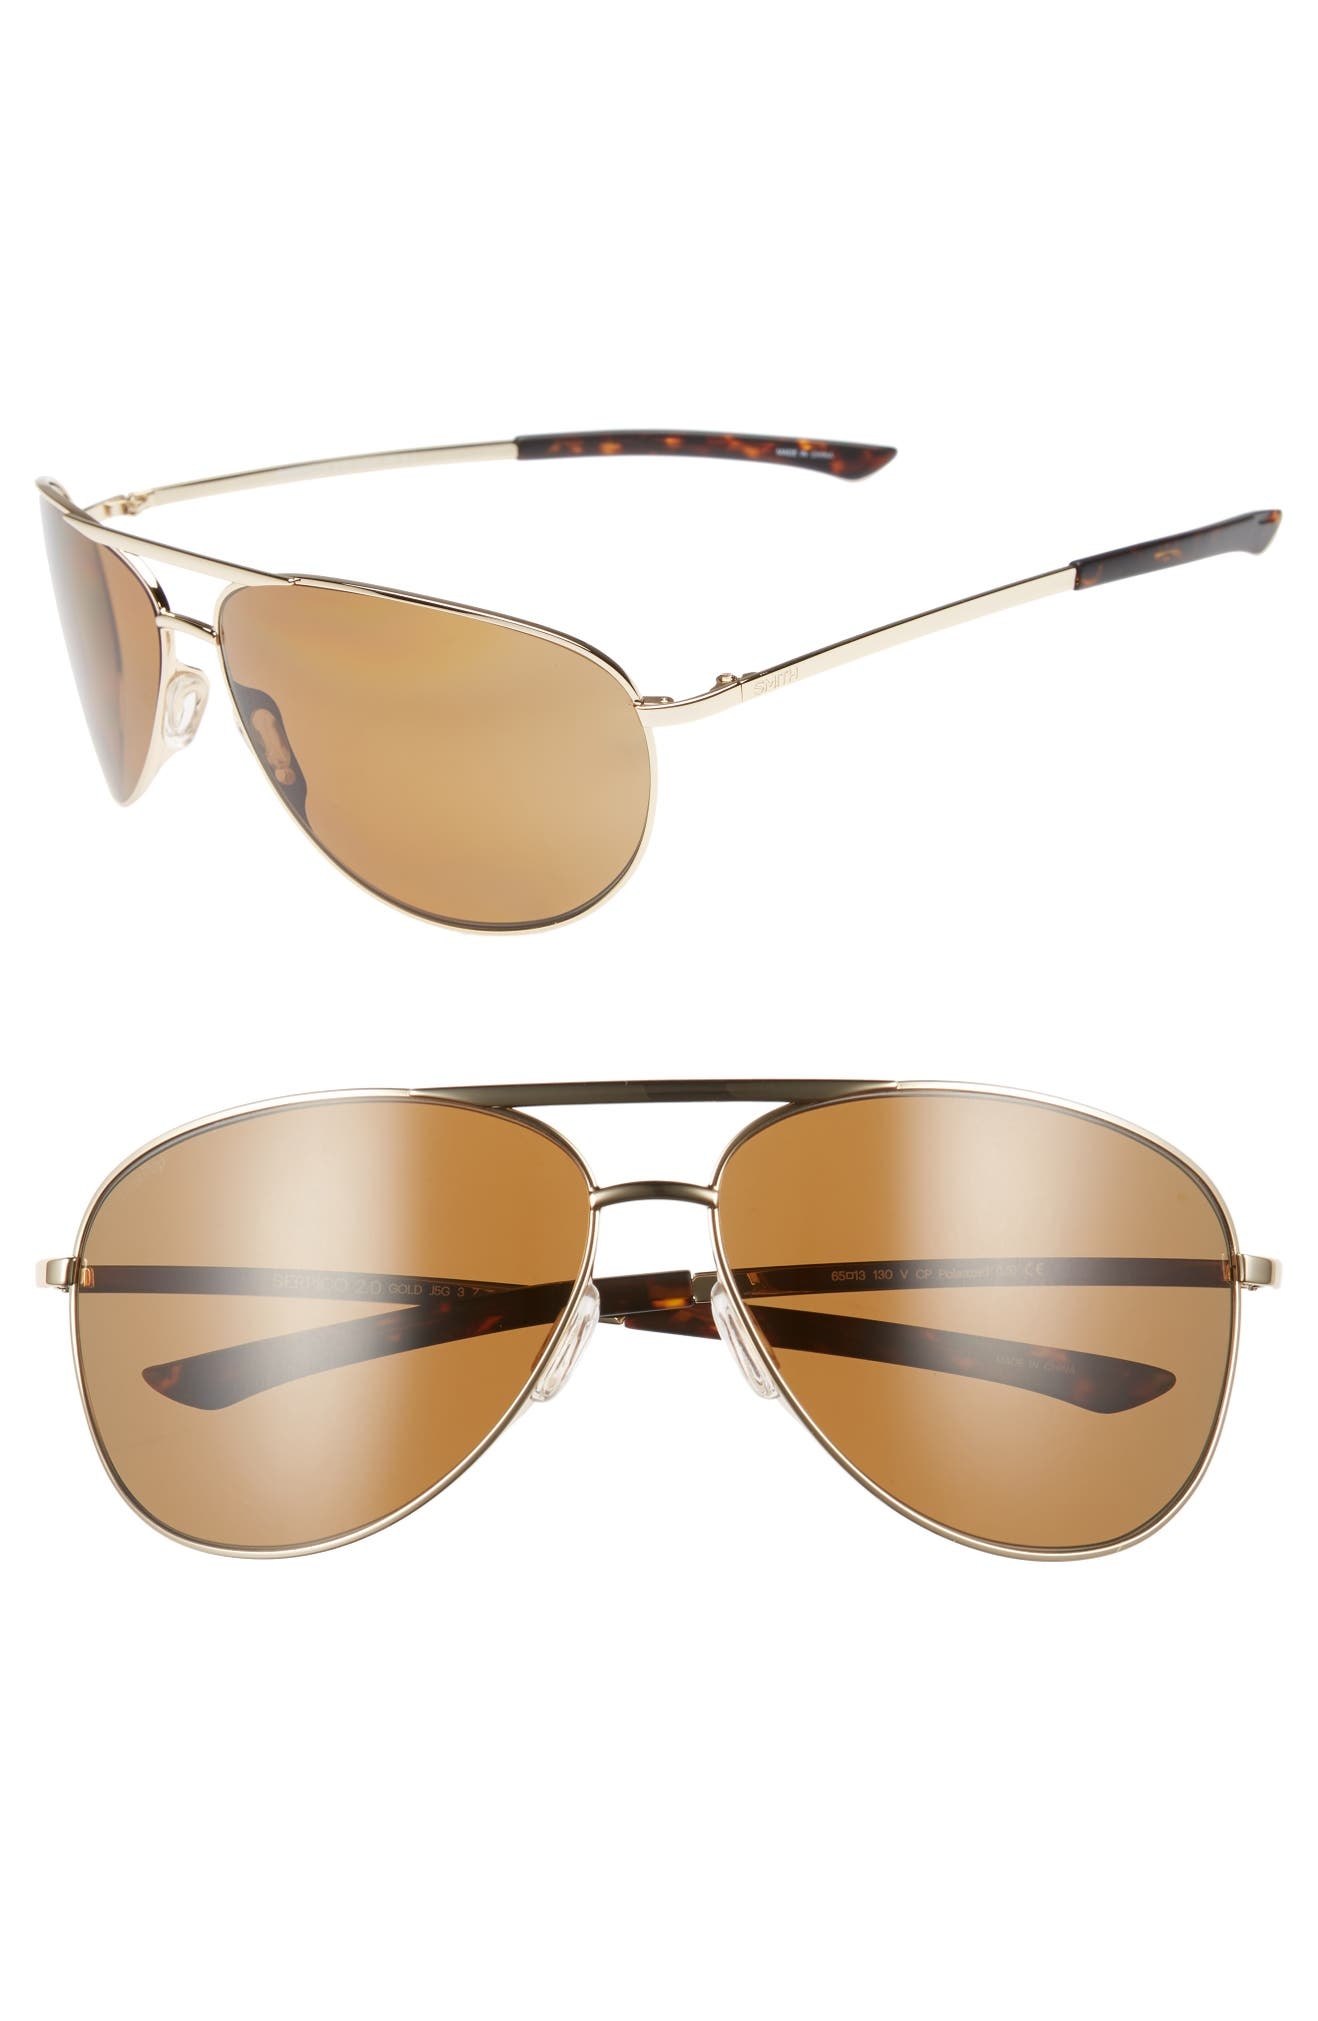 bfa80f14b65 Smith Serpico Slim 2.0 65mm ChromaPop™ Polarized Aviator Sunglasses ...